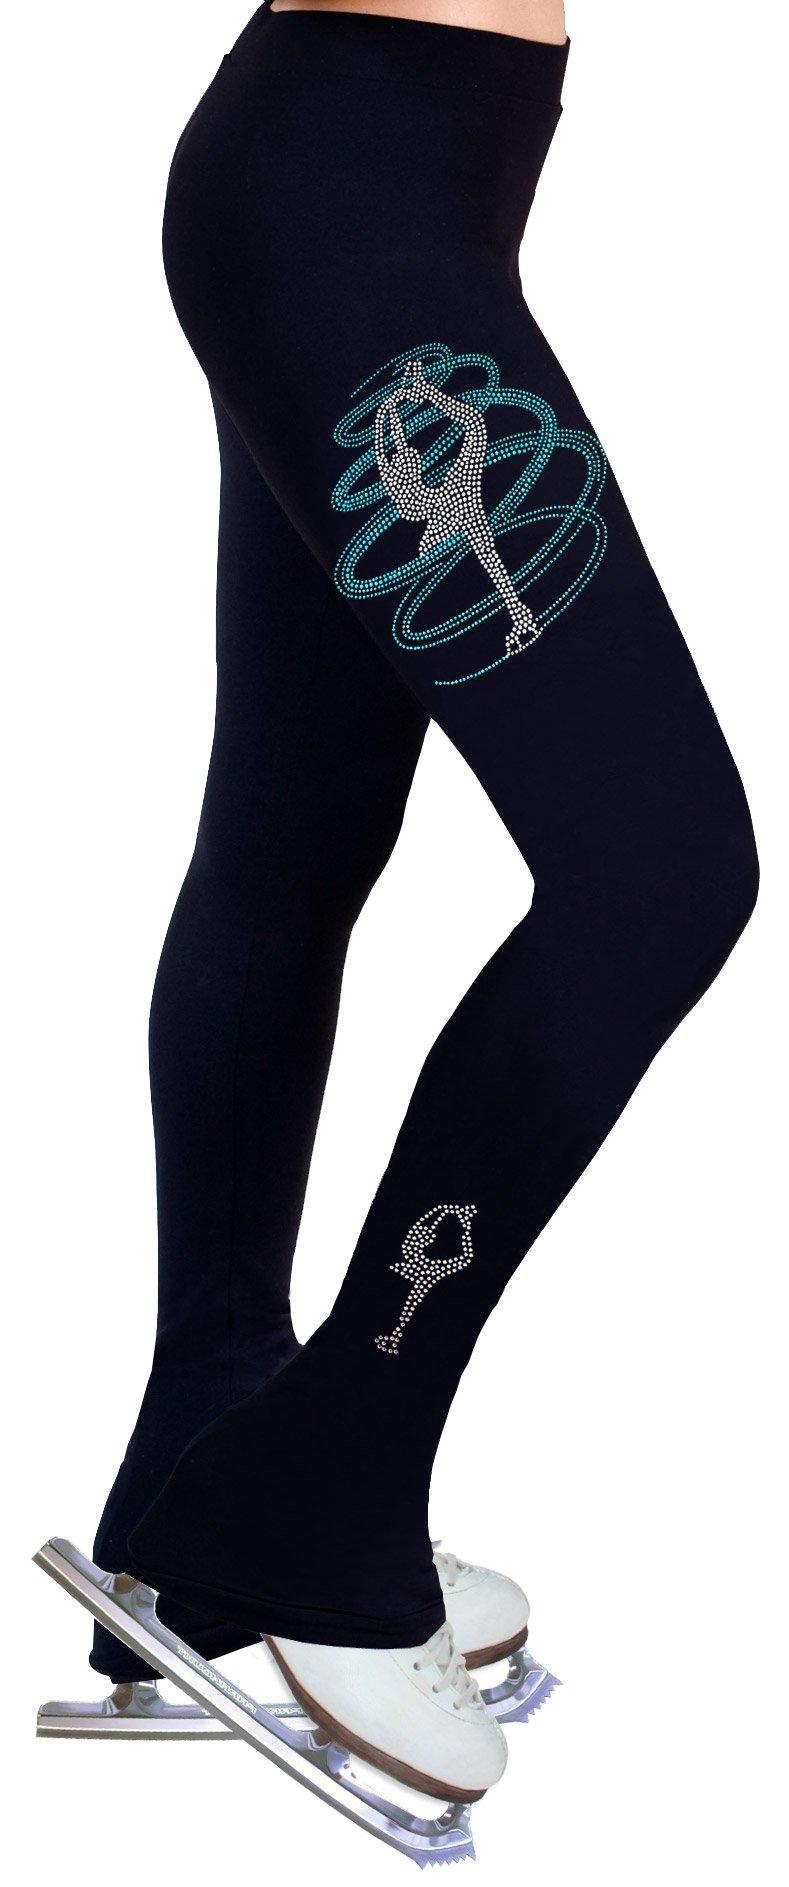 NY2 SPORTSWEAR Figure Skating Practice Pants with Rhinestones R255 (Adult Large)